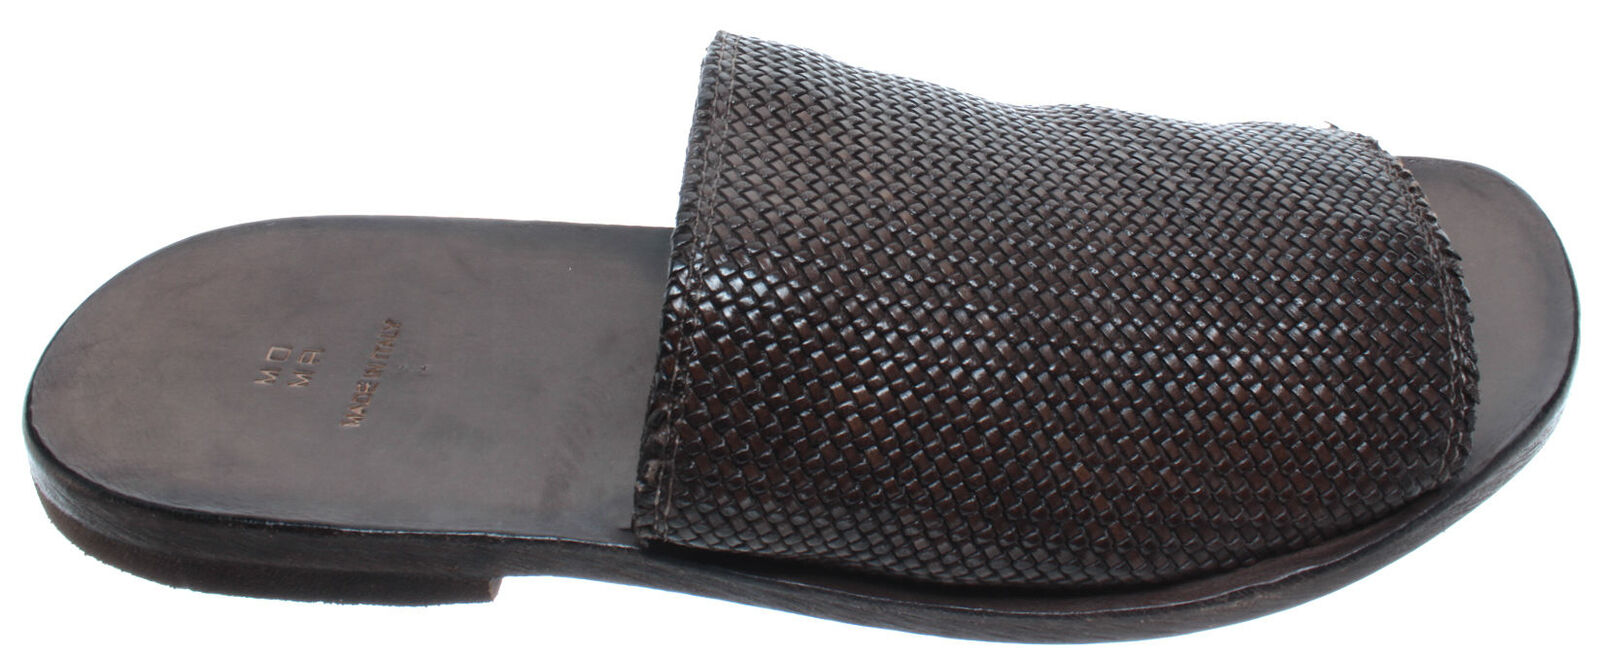 MOMA Sandales Chaussons Homme 23902-XB Canguro Da Intreccio Cuir marrón Nouveau